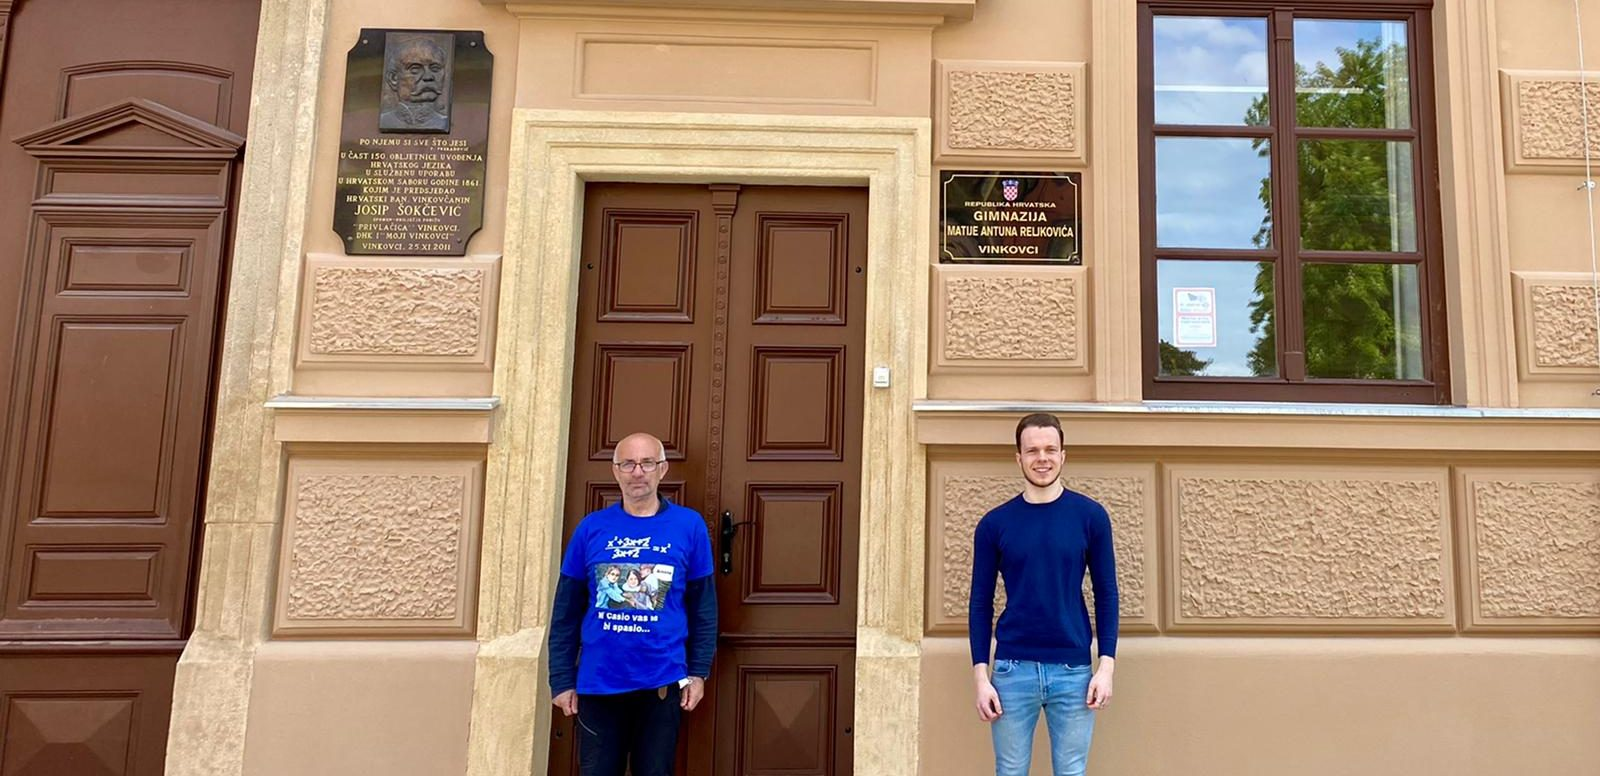 David i mentor prof. Krpan